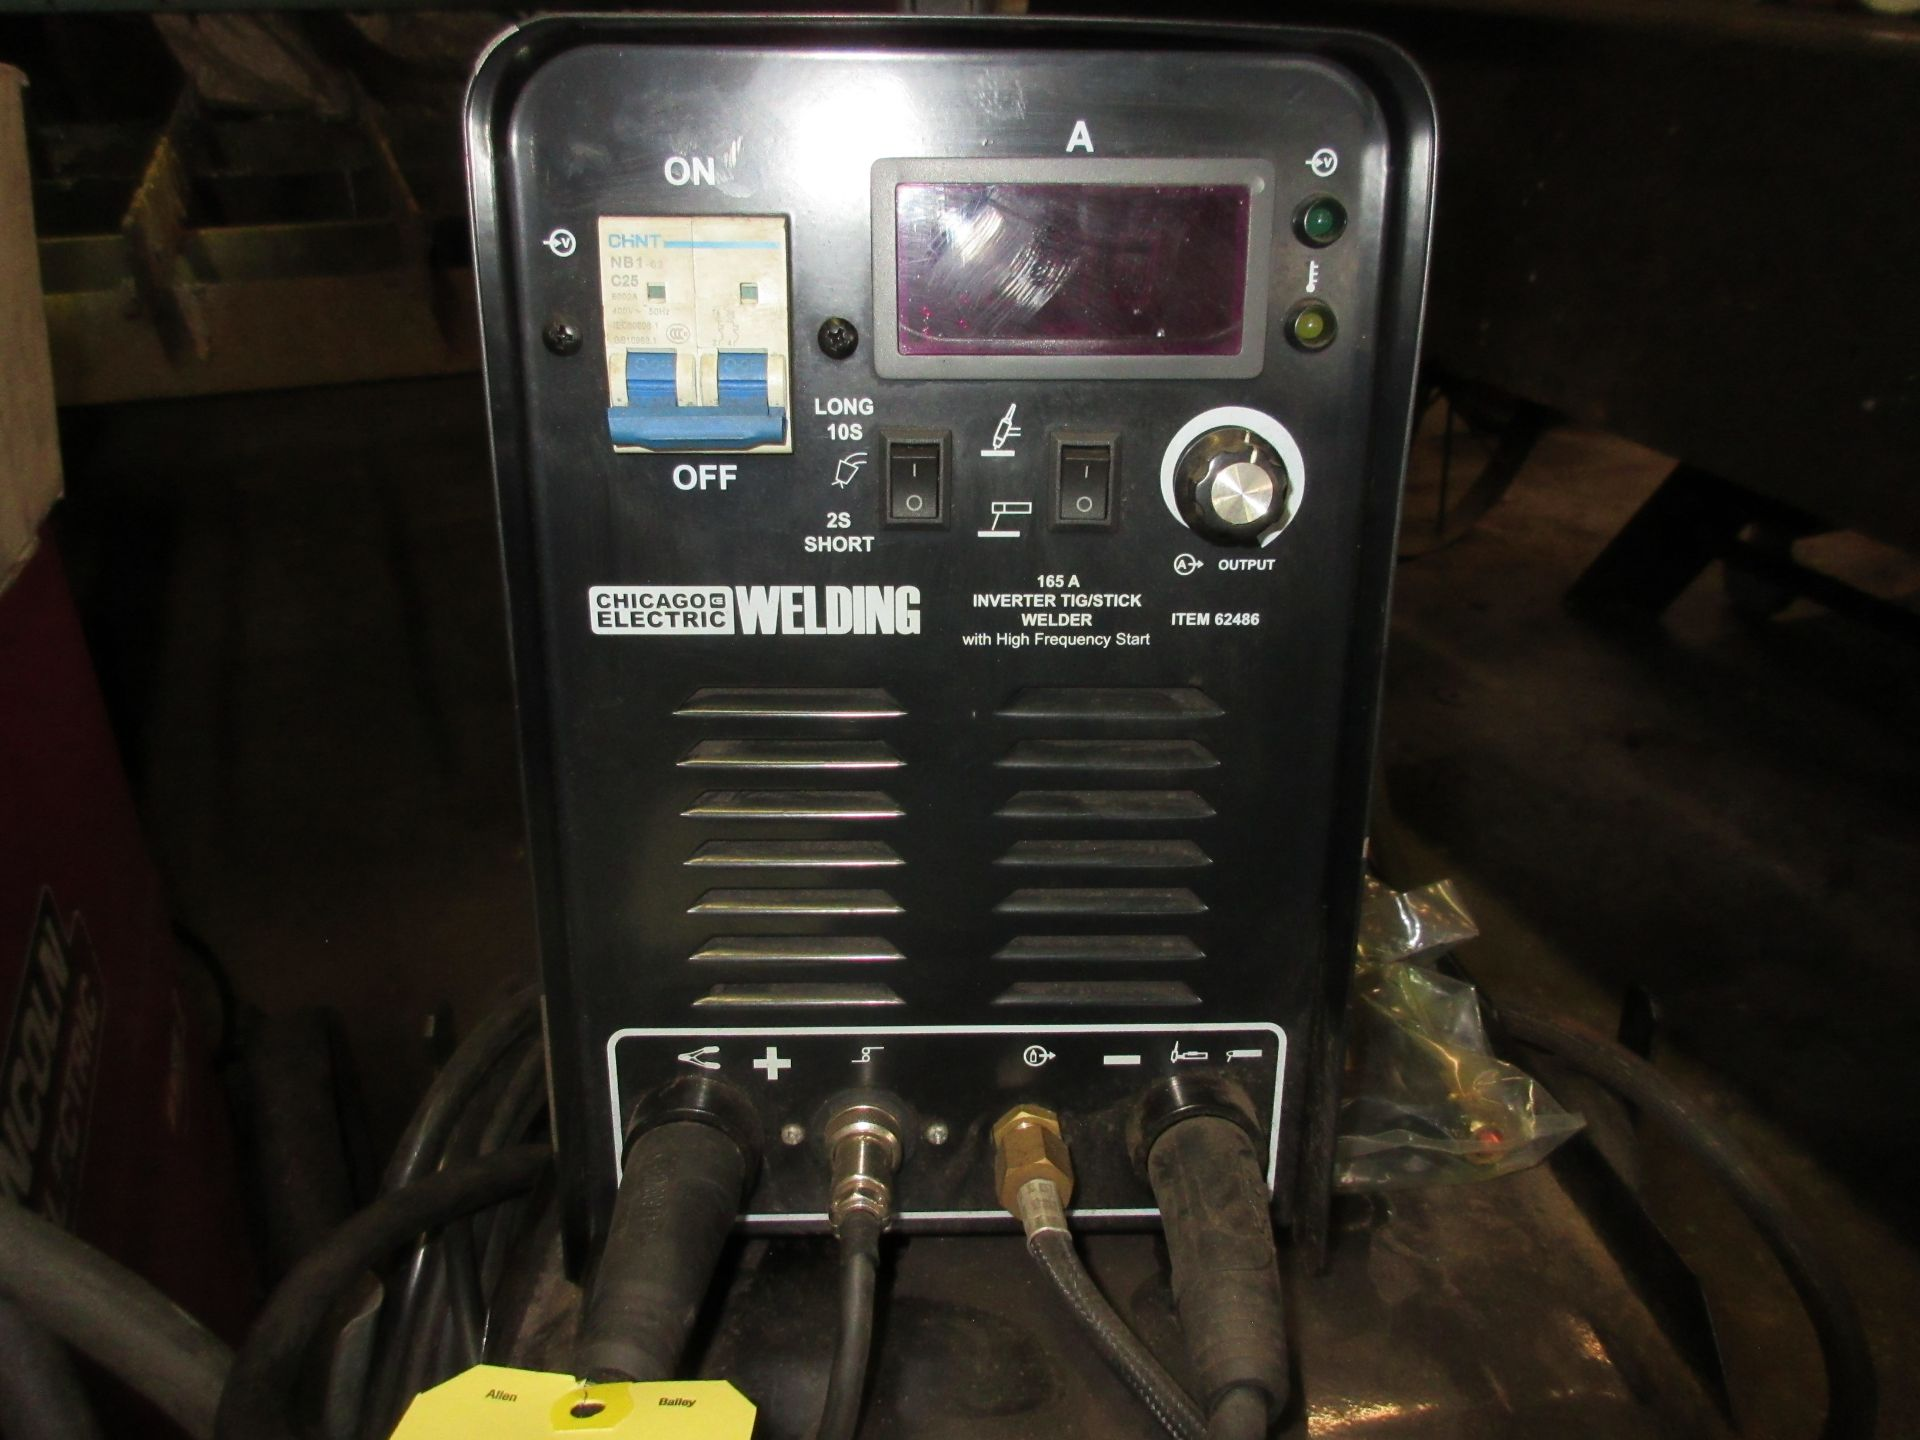 (1) IGBT Arc 160D Invertor Arc Welder w/ Chicago Electric Invertor Tig/Stick Welder, Foot Control - Image 4 of 5